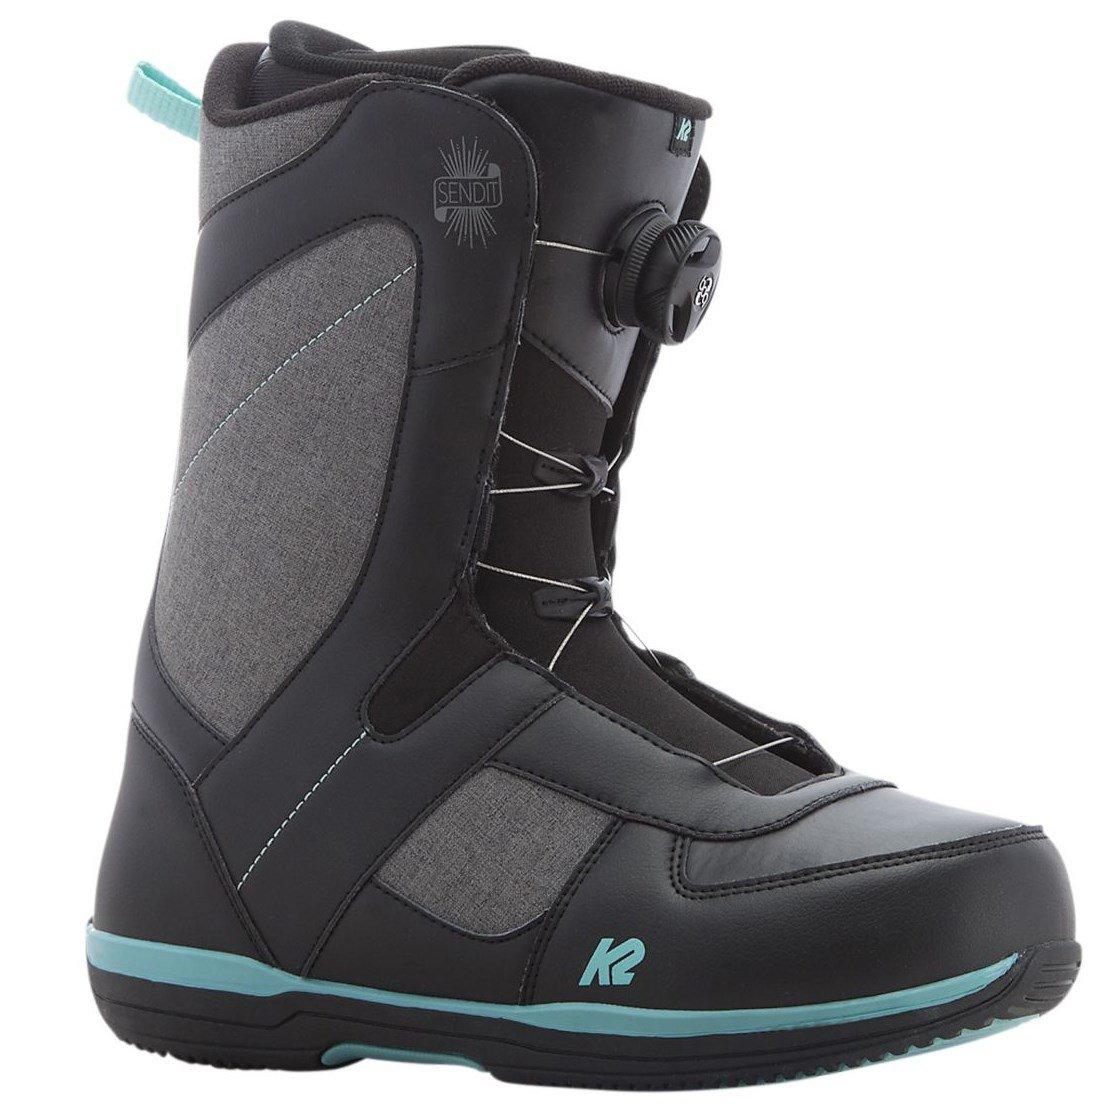 K2 Sendit Snowboard Boots Womens 2018 Evo